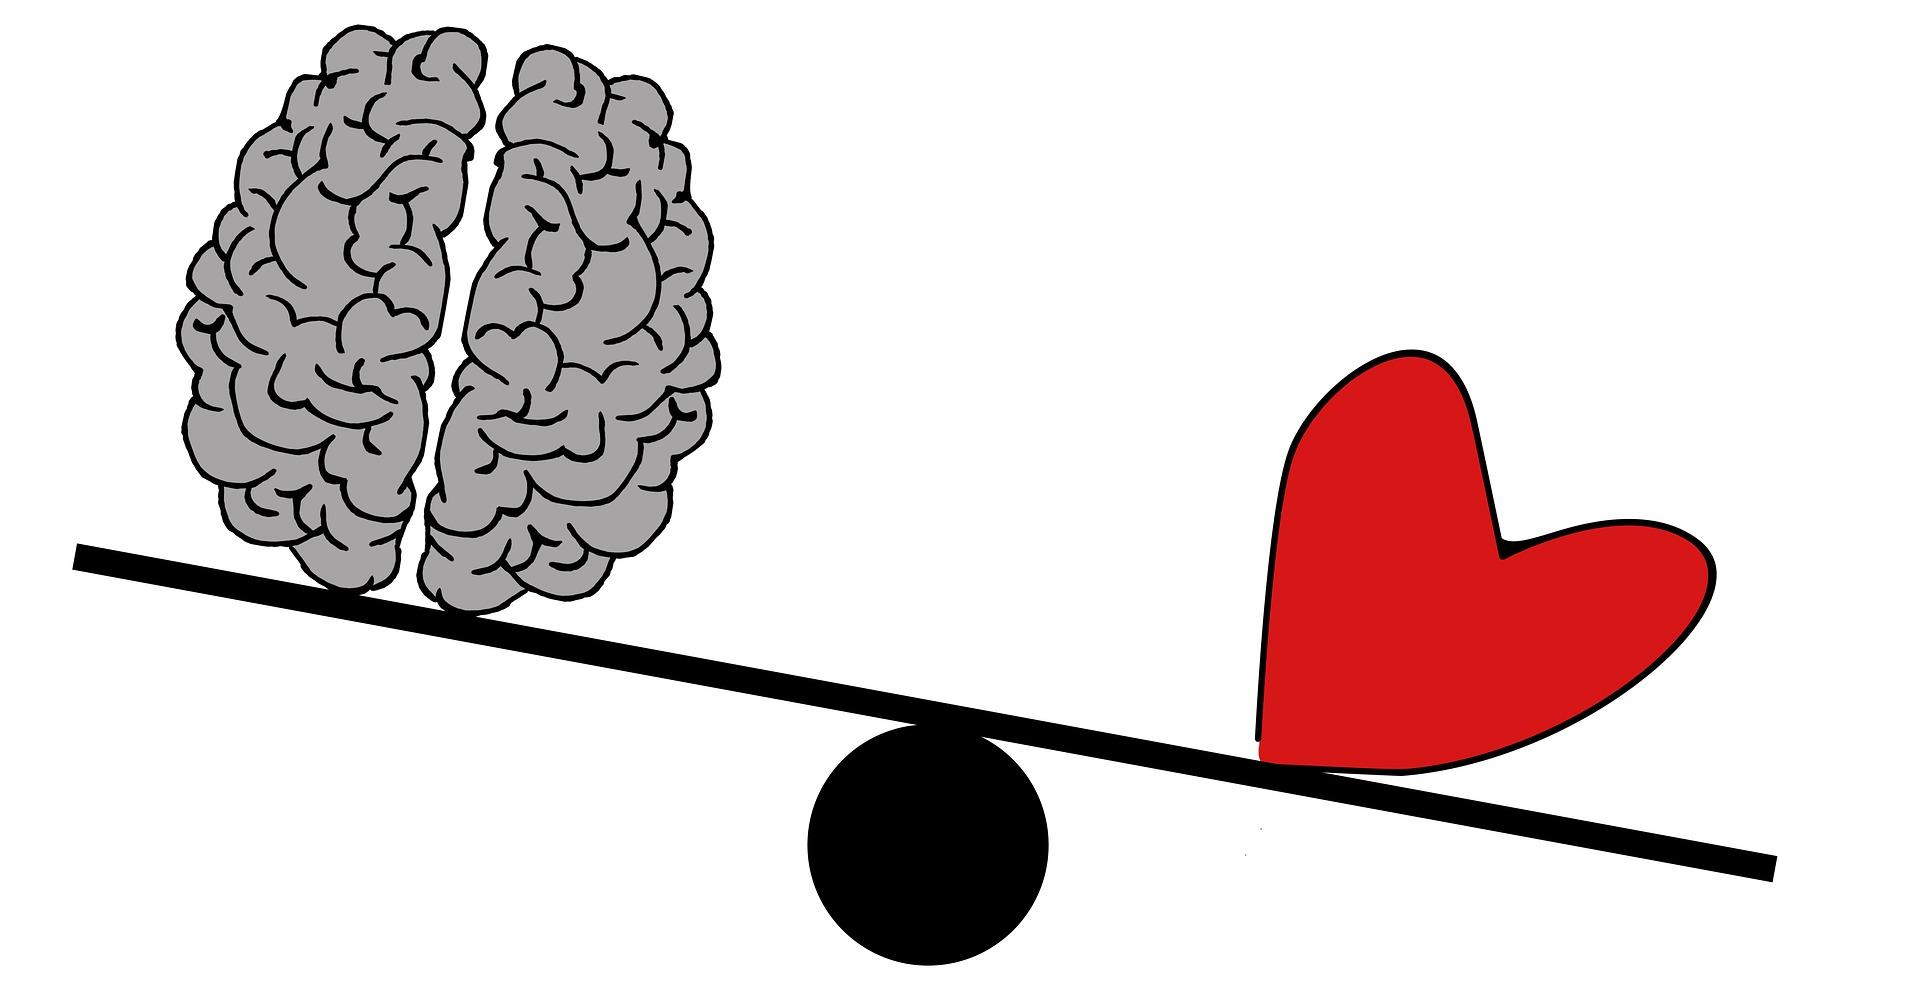 brain-2146168_1920